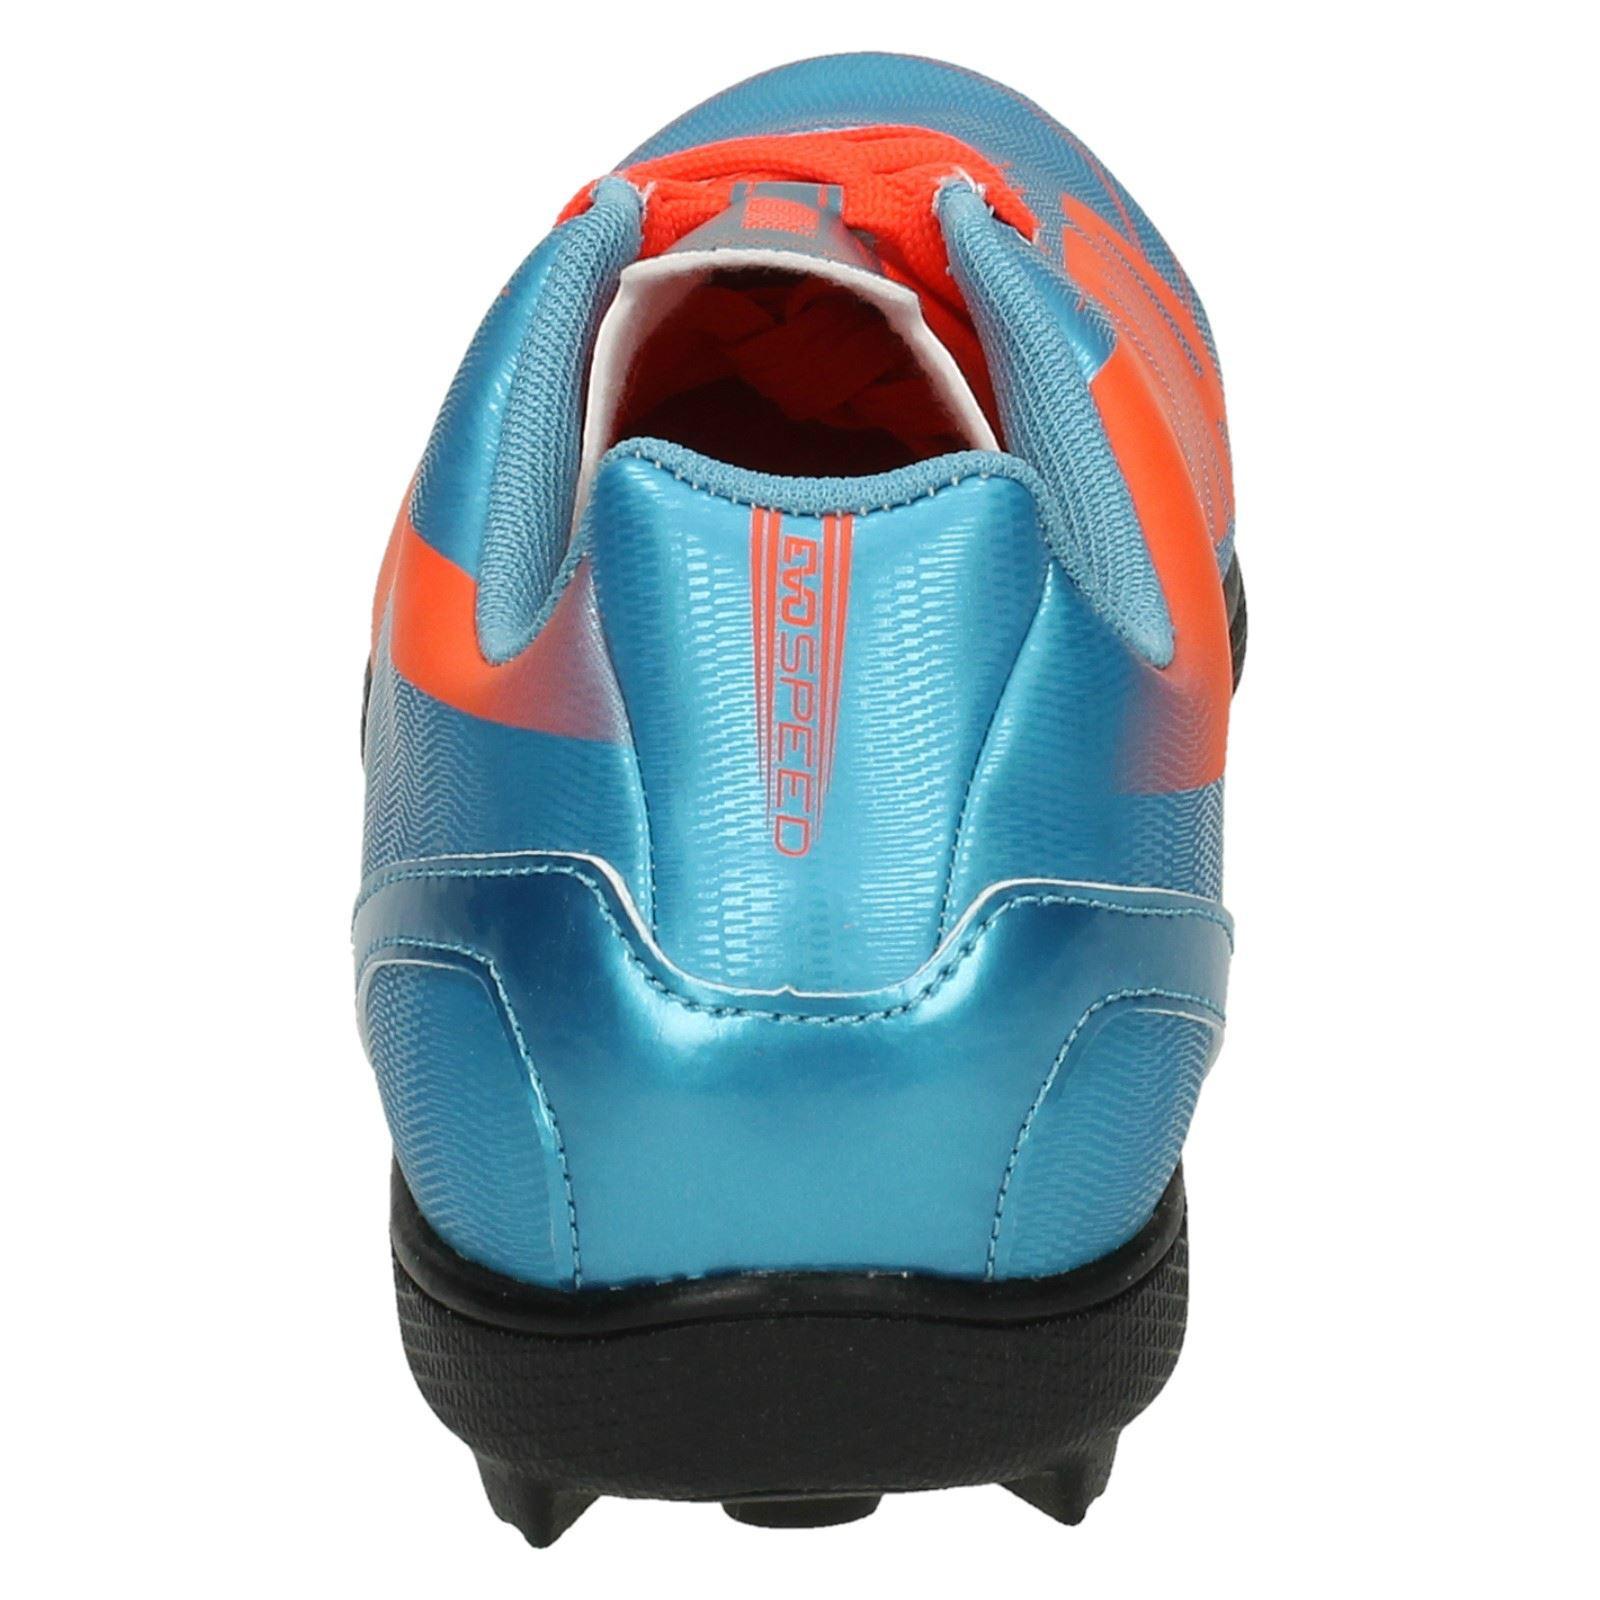 Zapatillas Evo Velocidad chicos Puma manchas 5.2 TT Jr